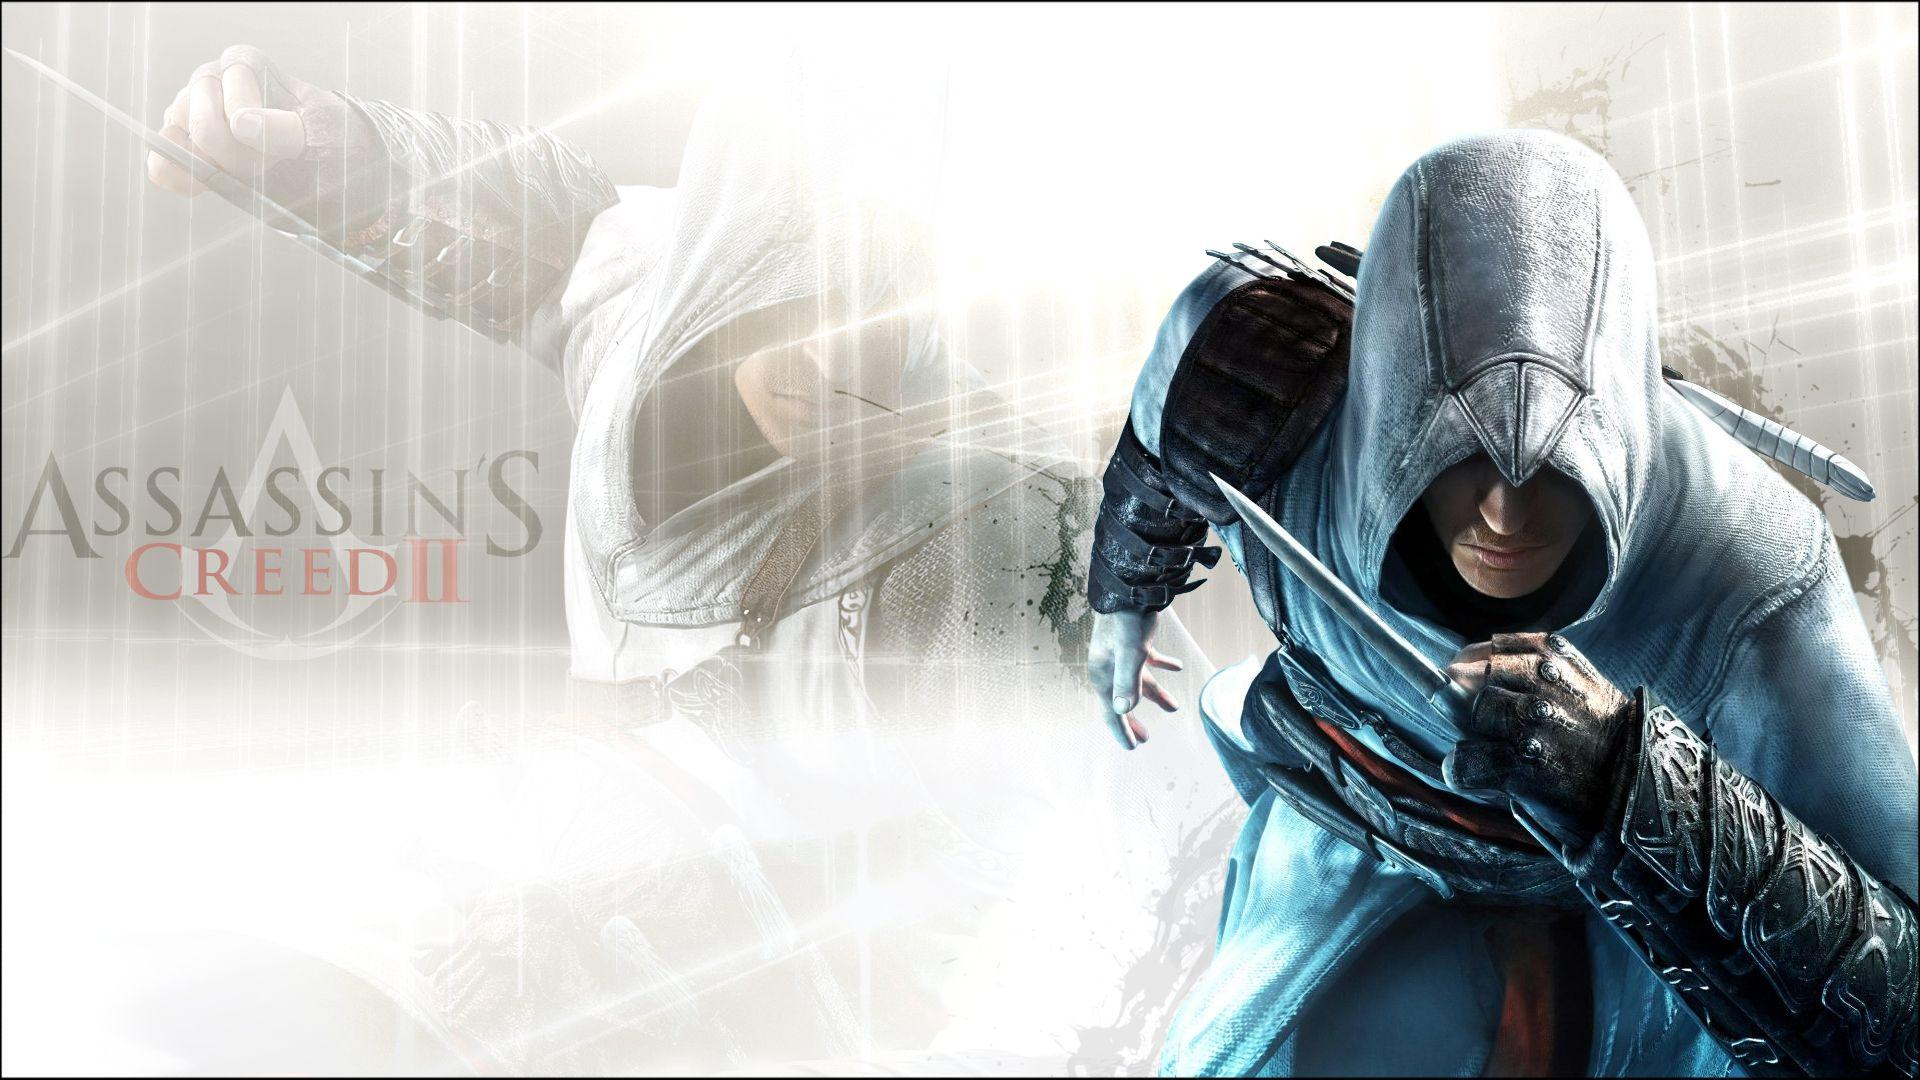 Assassins Creed 2 wallpaper   367403 1920x1080